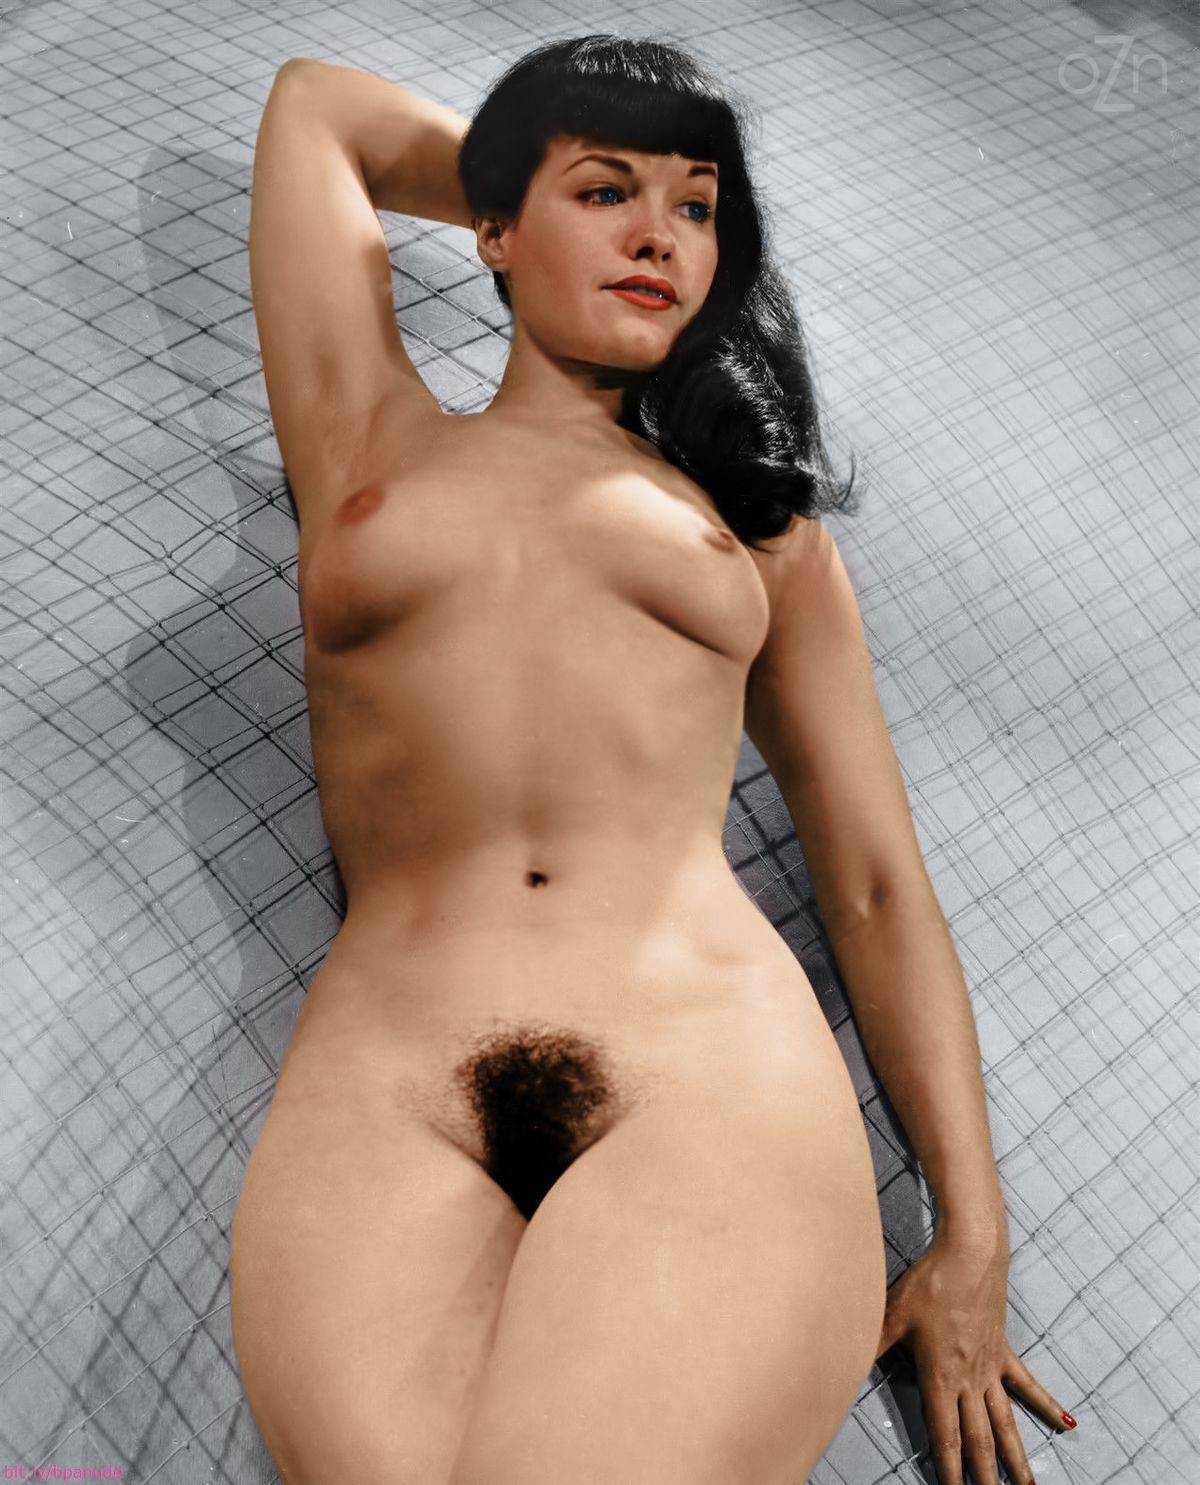 Ebony dressed undressed women